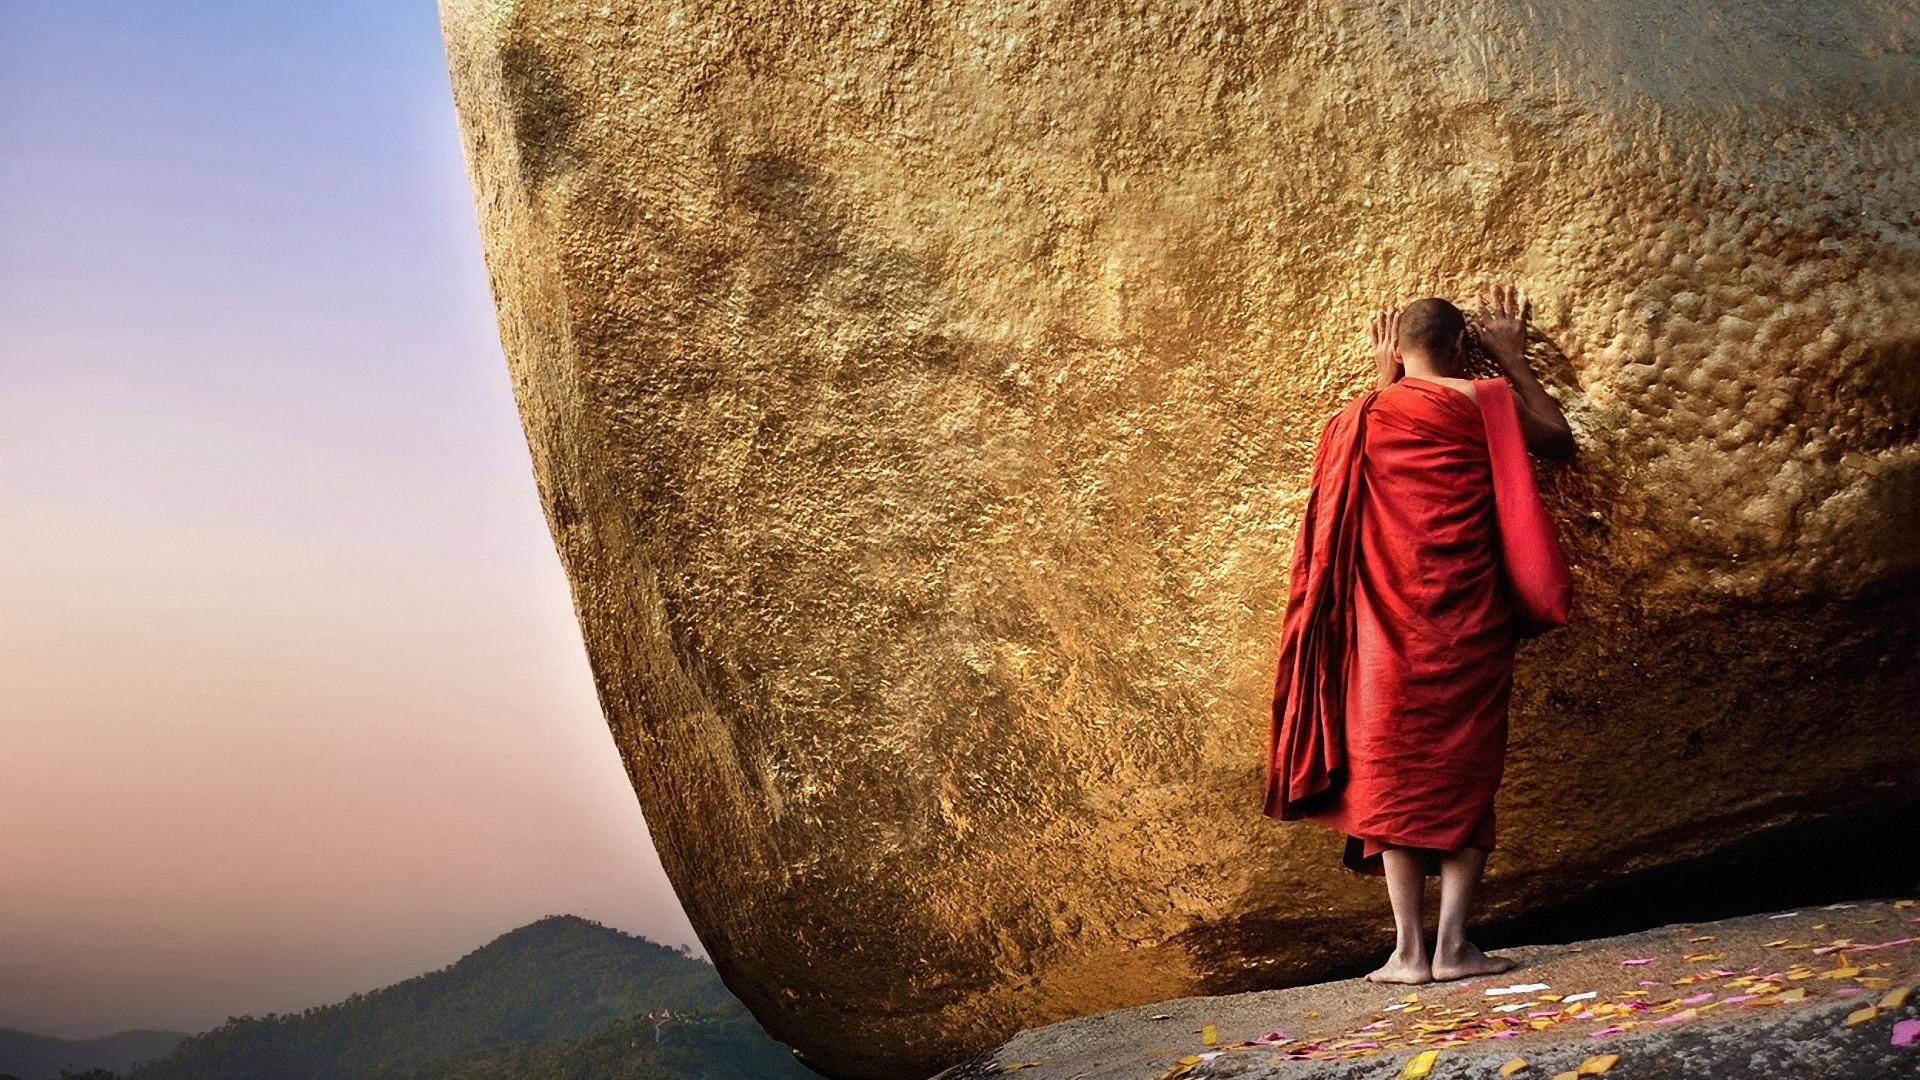 Preview wallpaper buddha, chayttiyo pagoda, golden hill, monk, burma,  myanmar 1920×1080